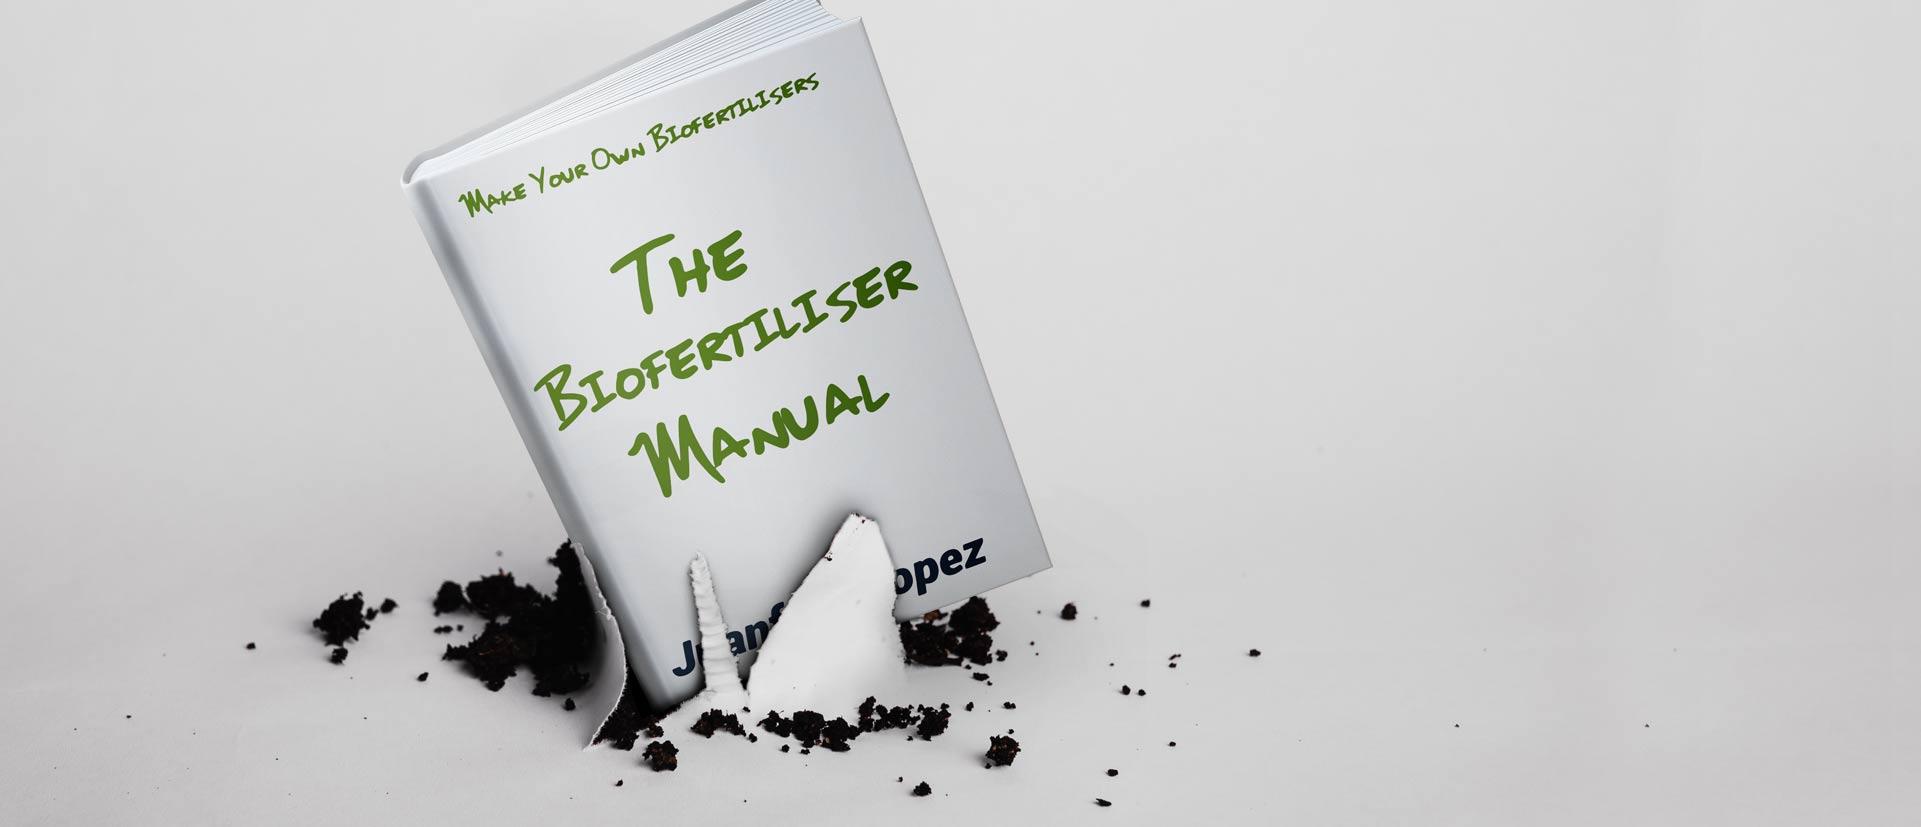 juanfran lópez the biofertilized manual